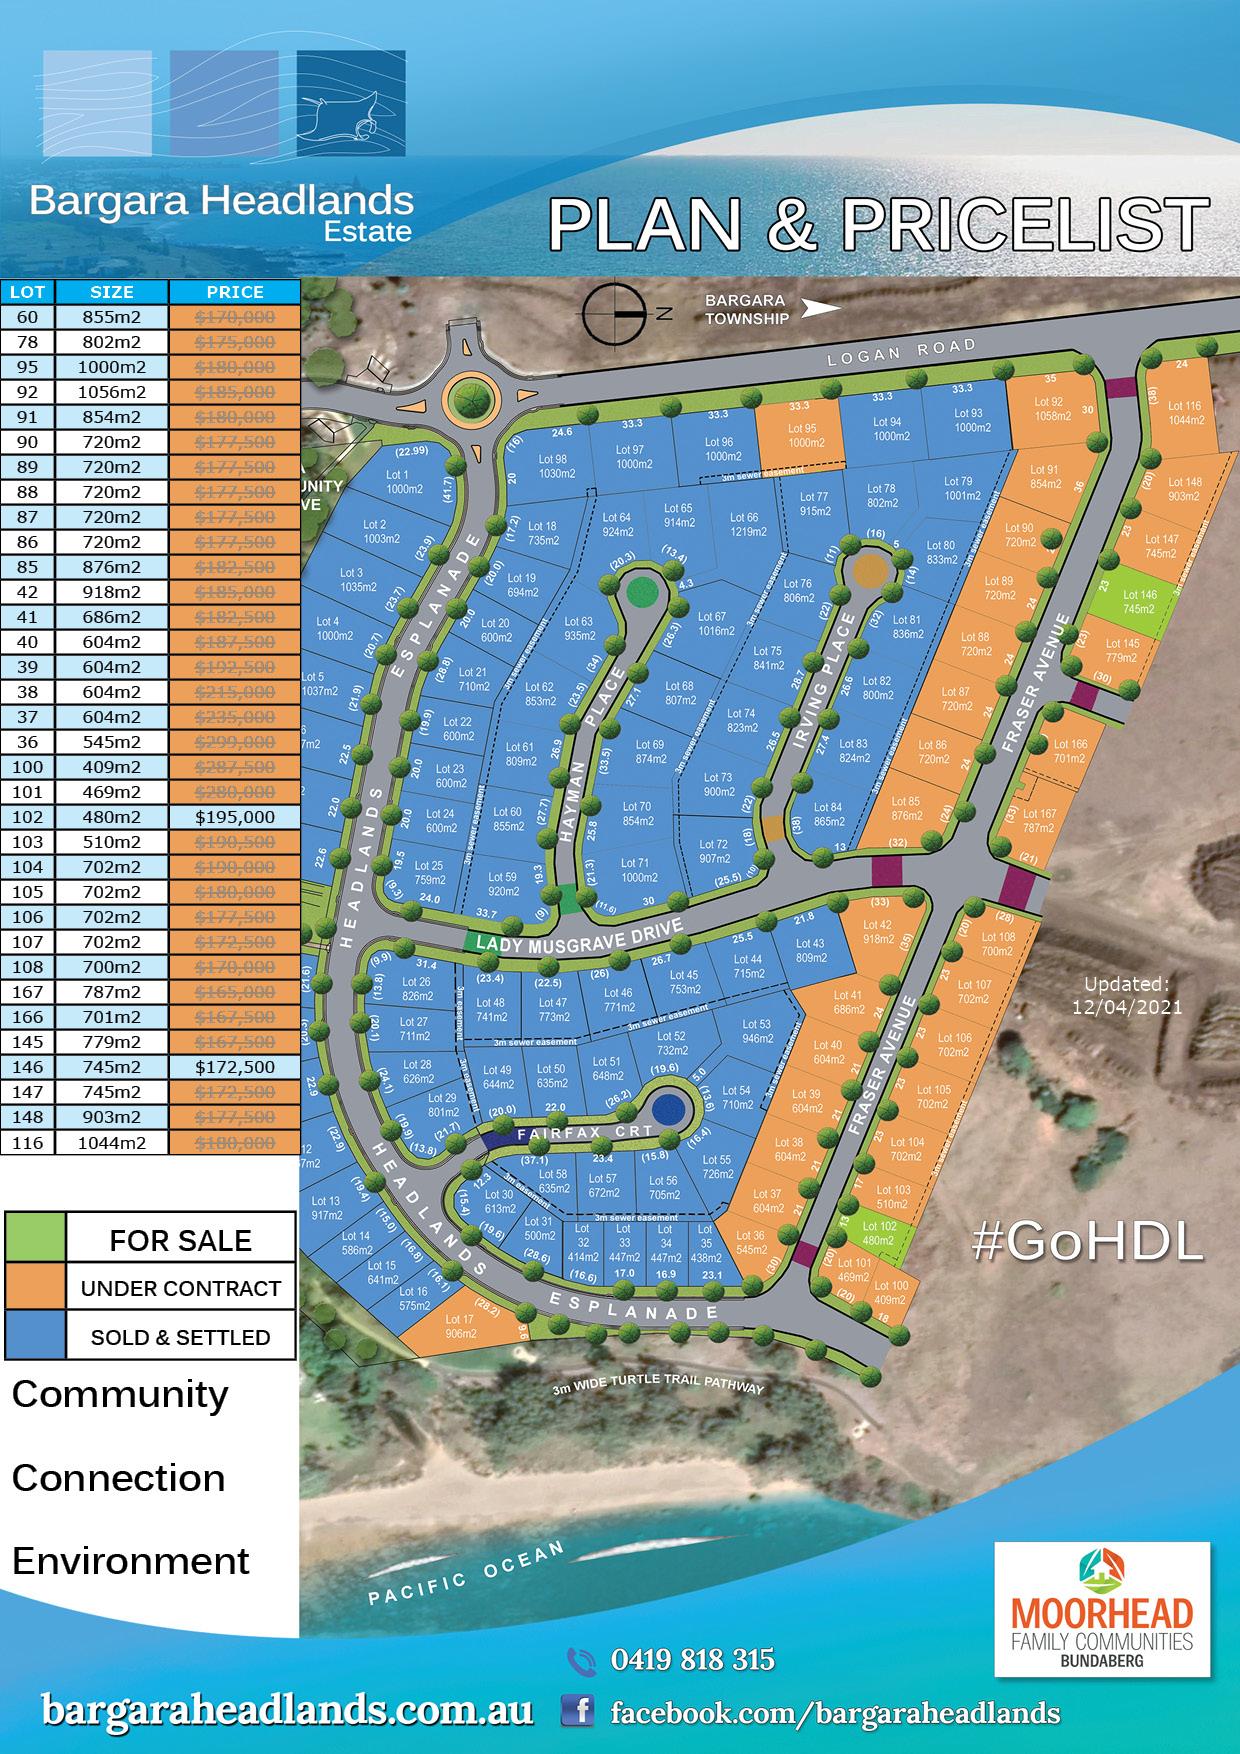 Plan & Price List - April 12, 2021 - Bargara Headlands Estate